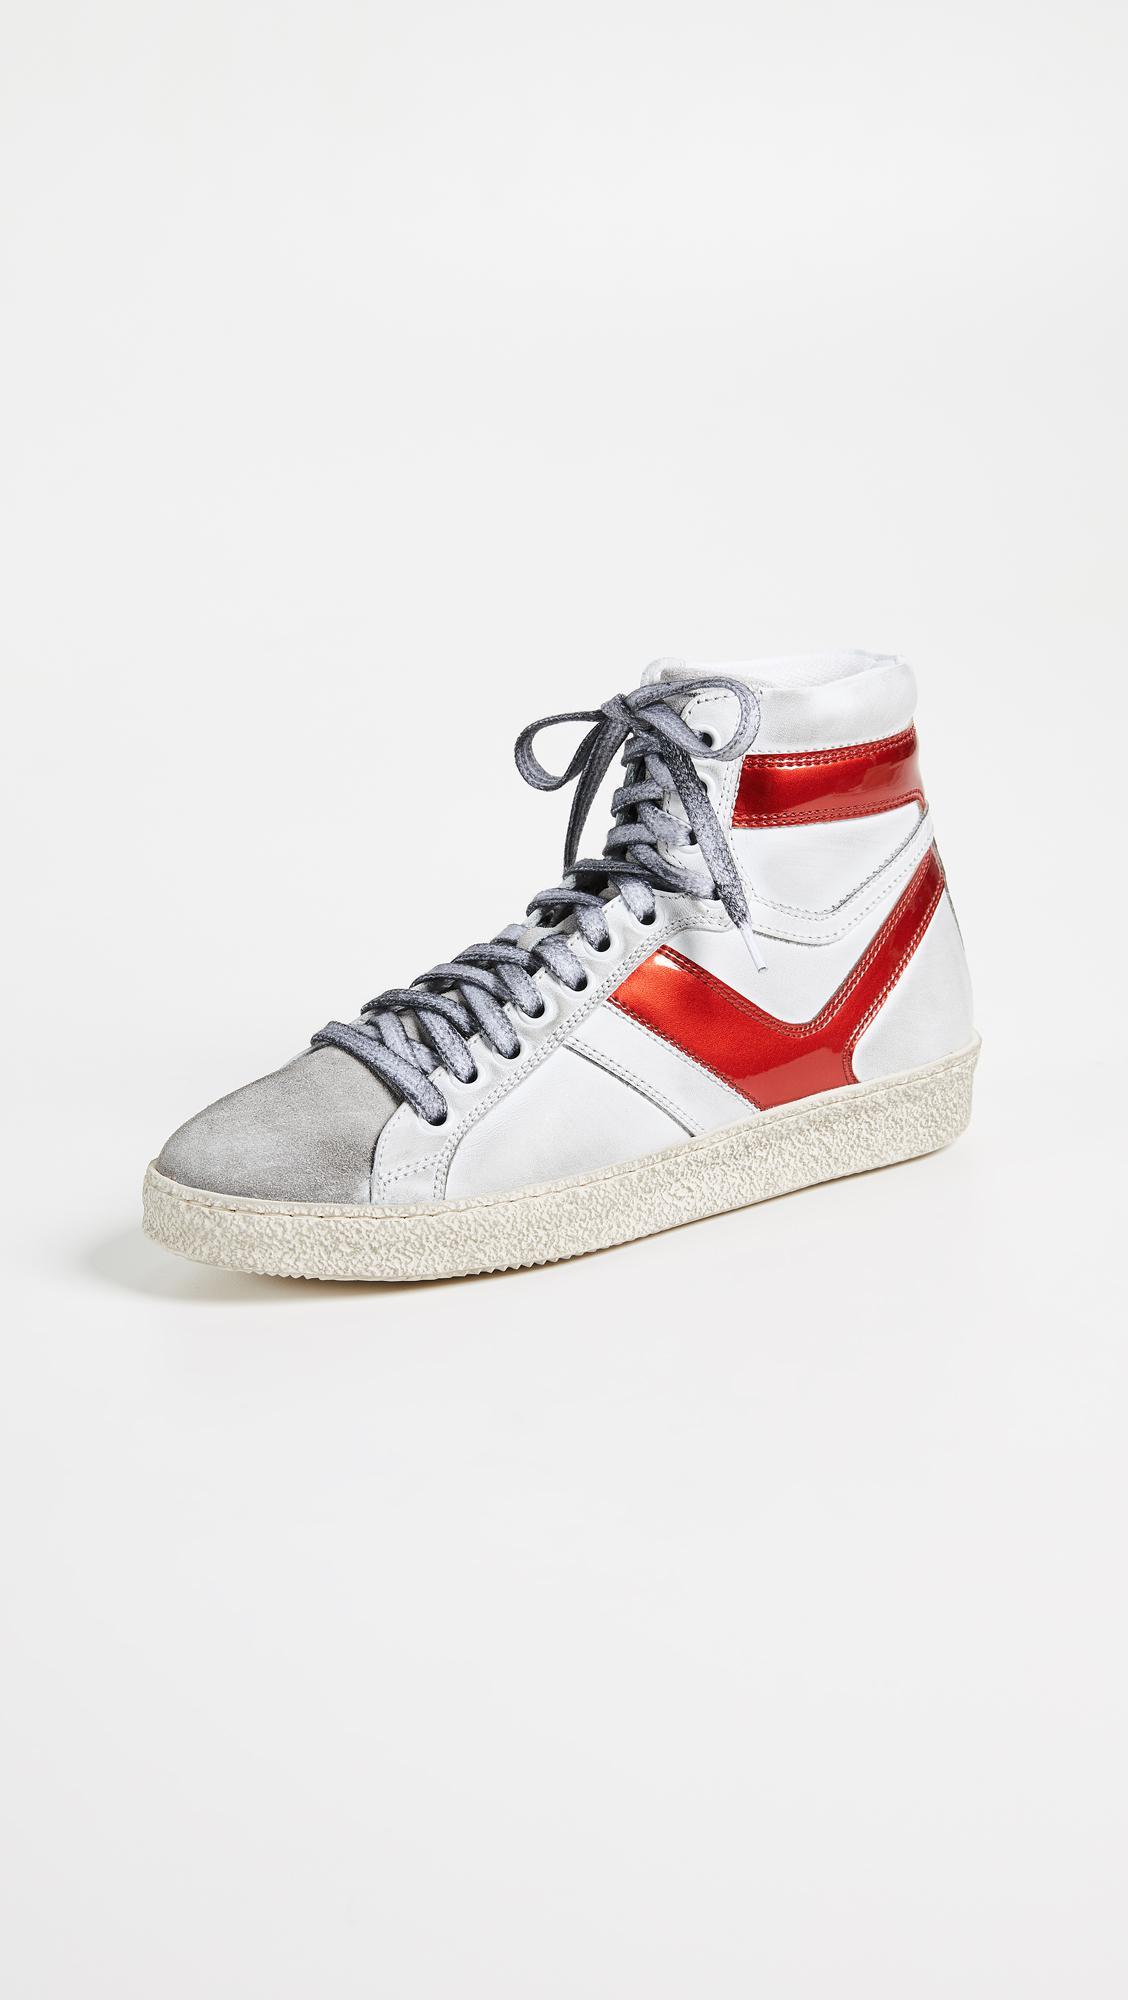 Iro-tops Et Hauts Chaussures De Sport aUofin